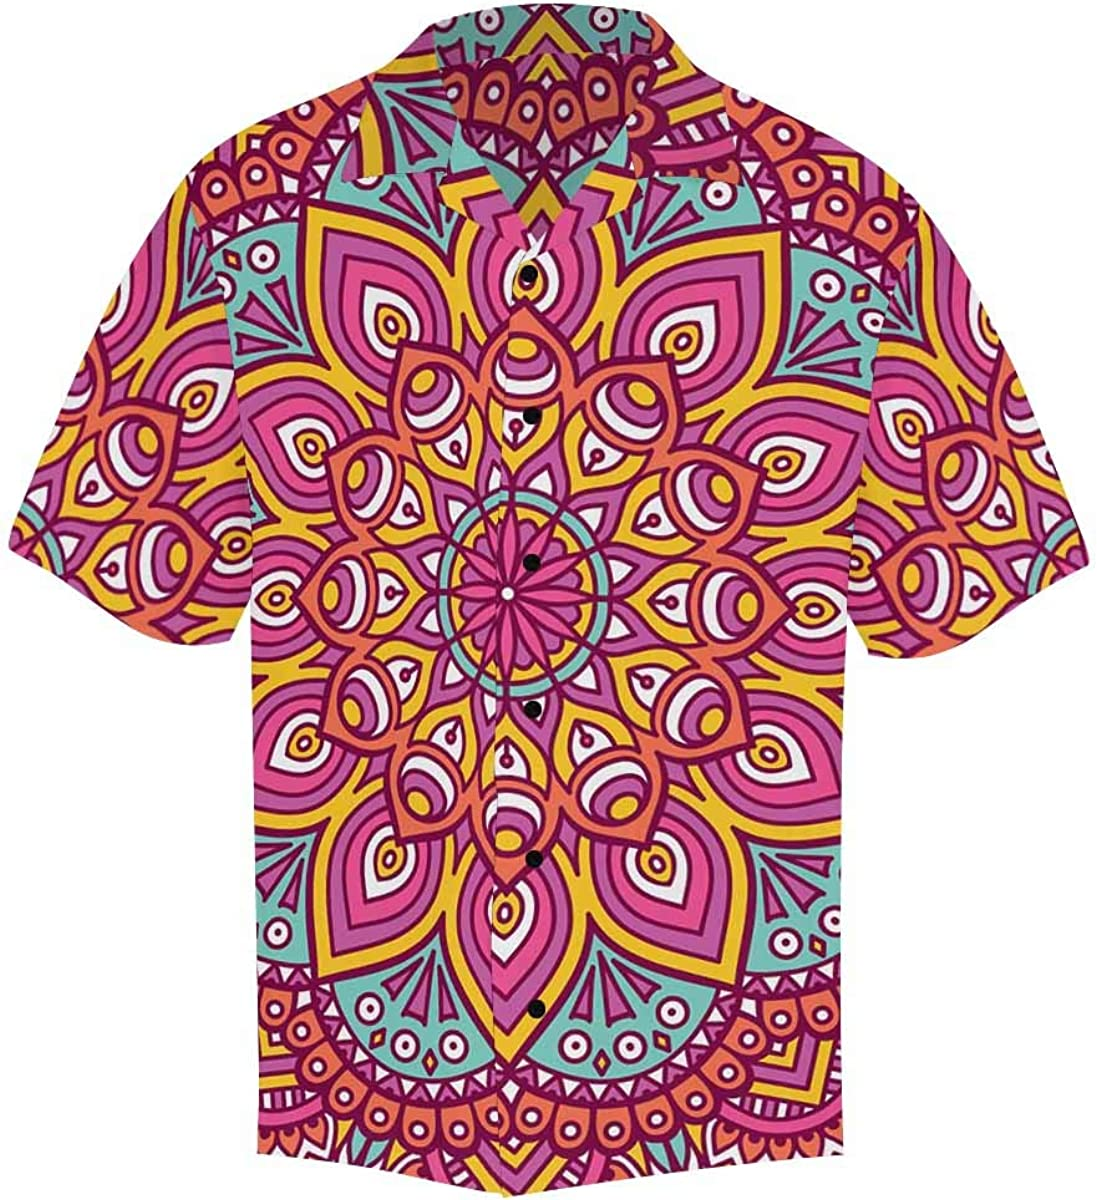 InterestPrint Men's Casual Button Down Short Sleeve Boho Mandala Floral Hawaiian Shirt (S-5XL)